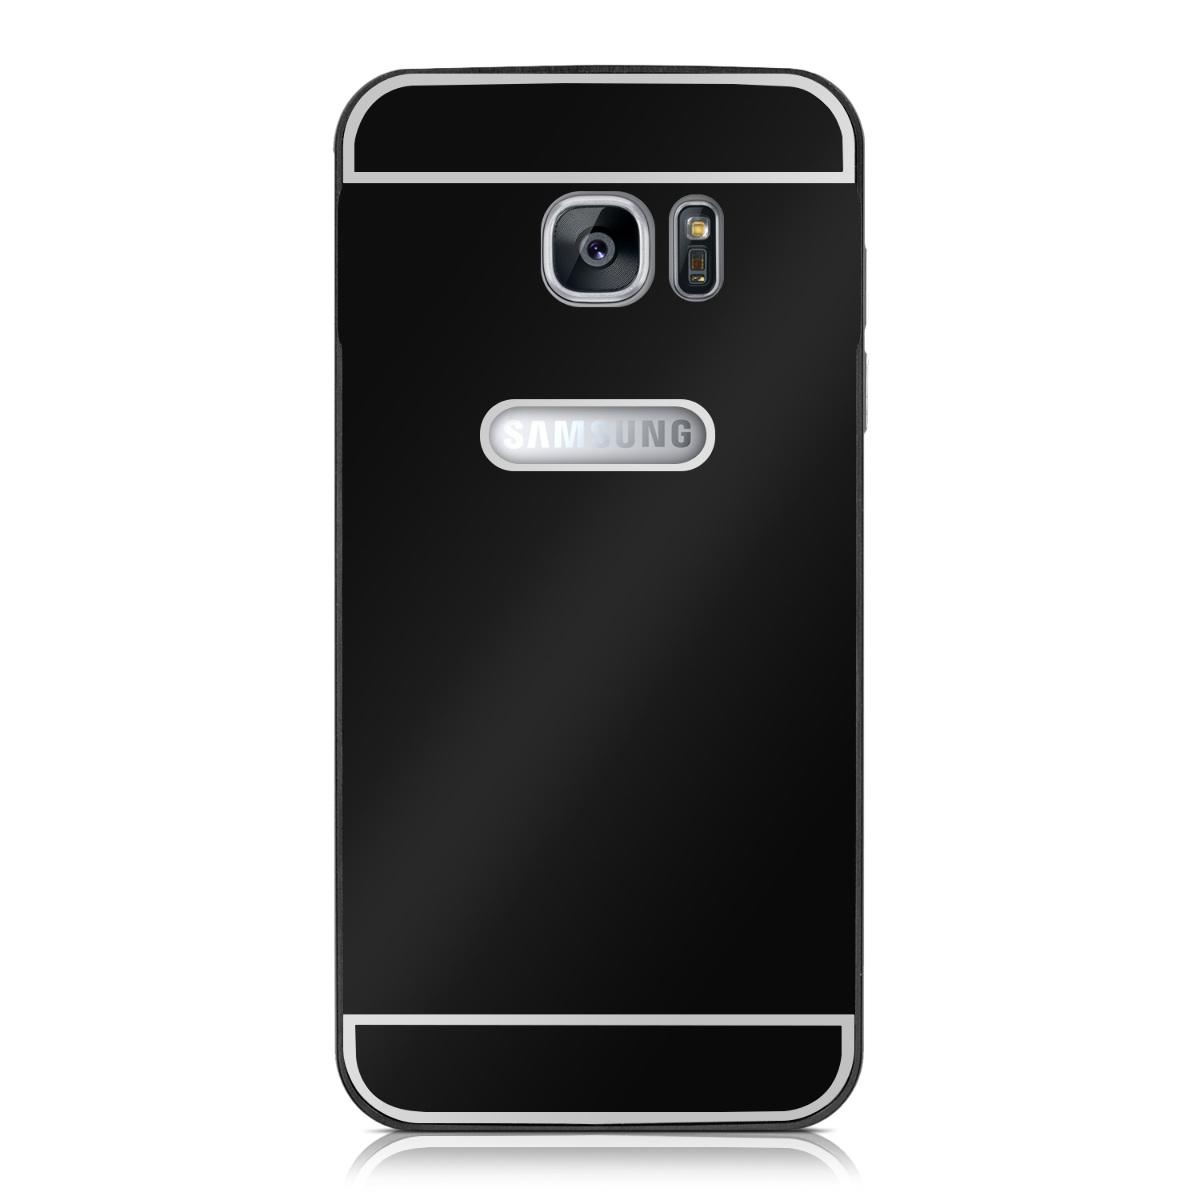 kwmobile alu bumper f r samsung galaxy s7 edge aluminium case cover schutz back. Black Bedroom Furniture Sets. Home Design Ideas